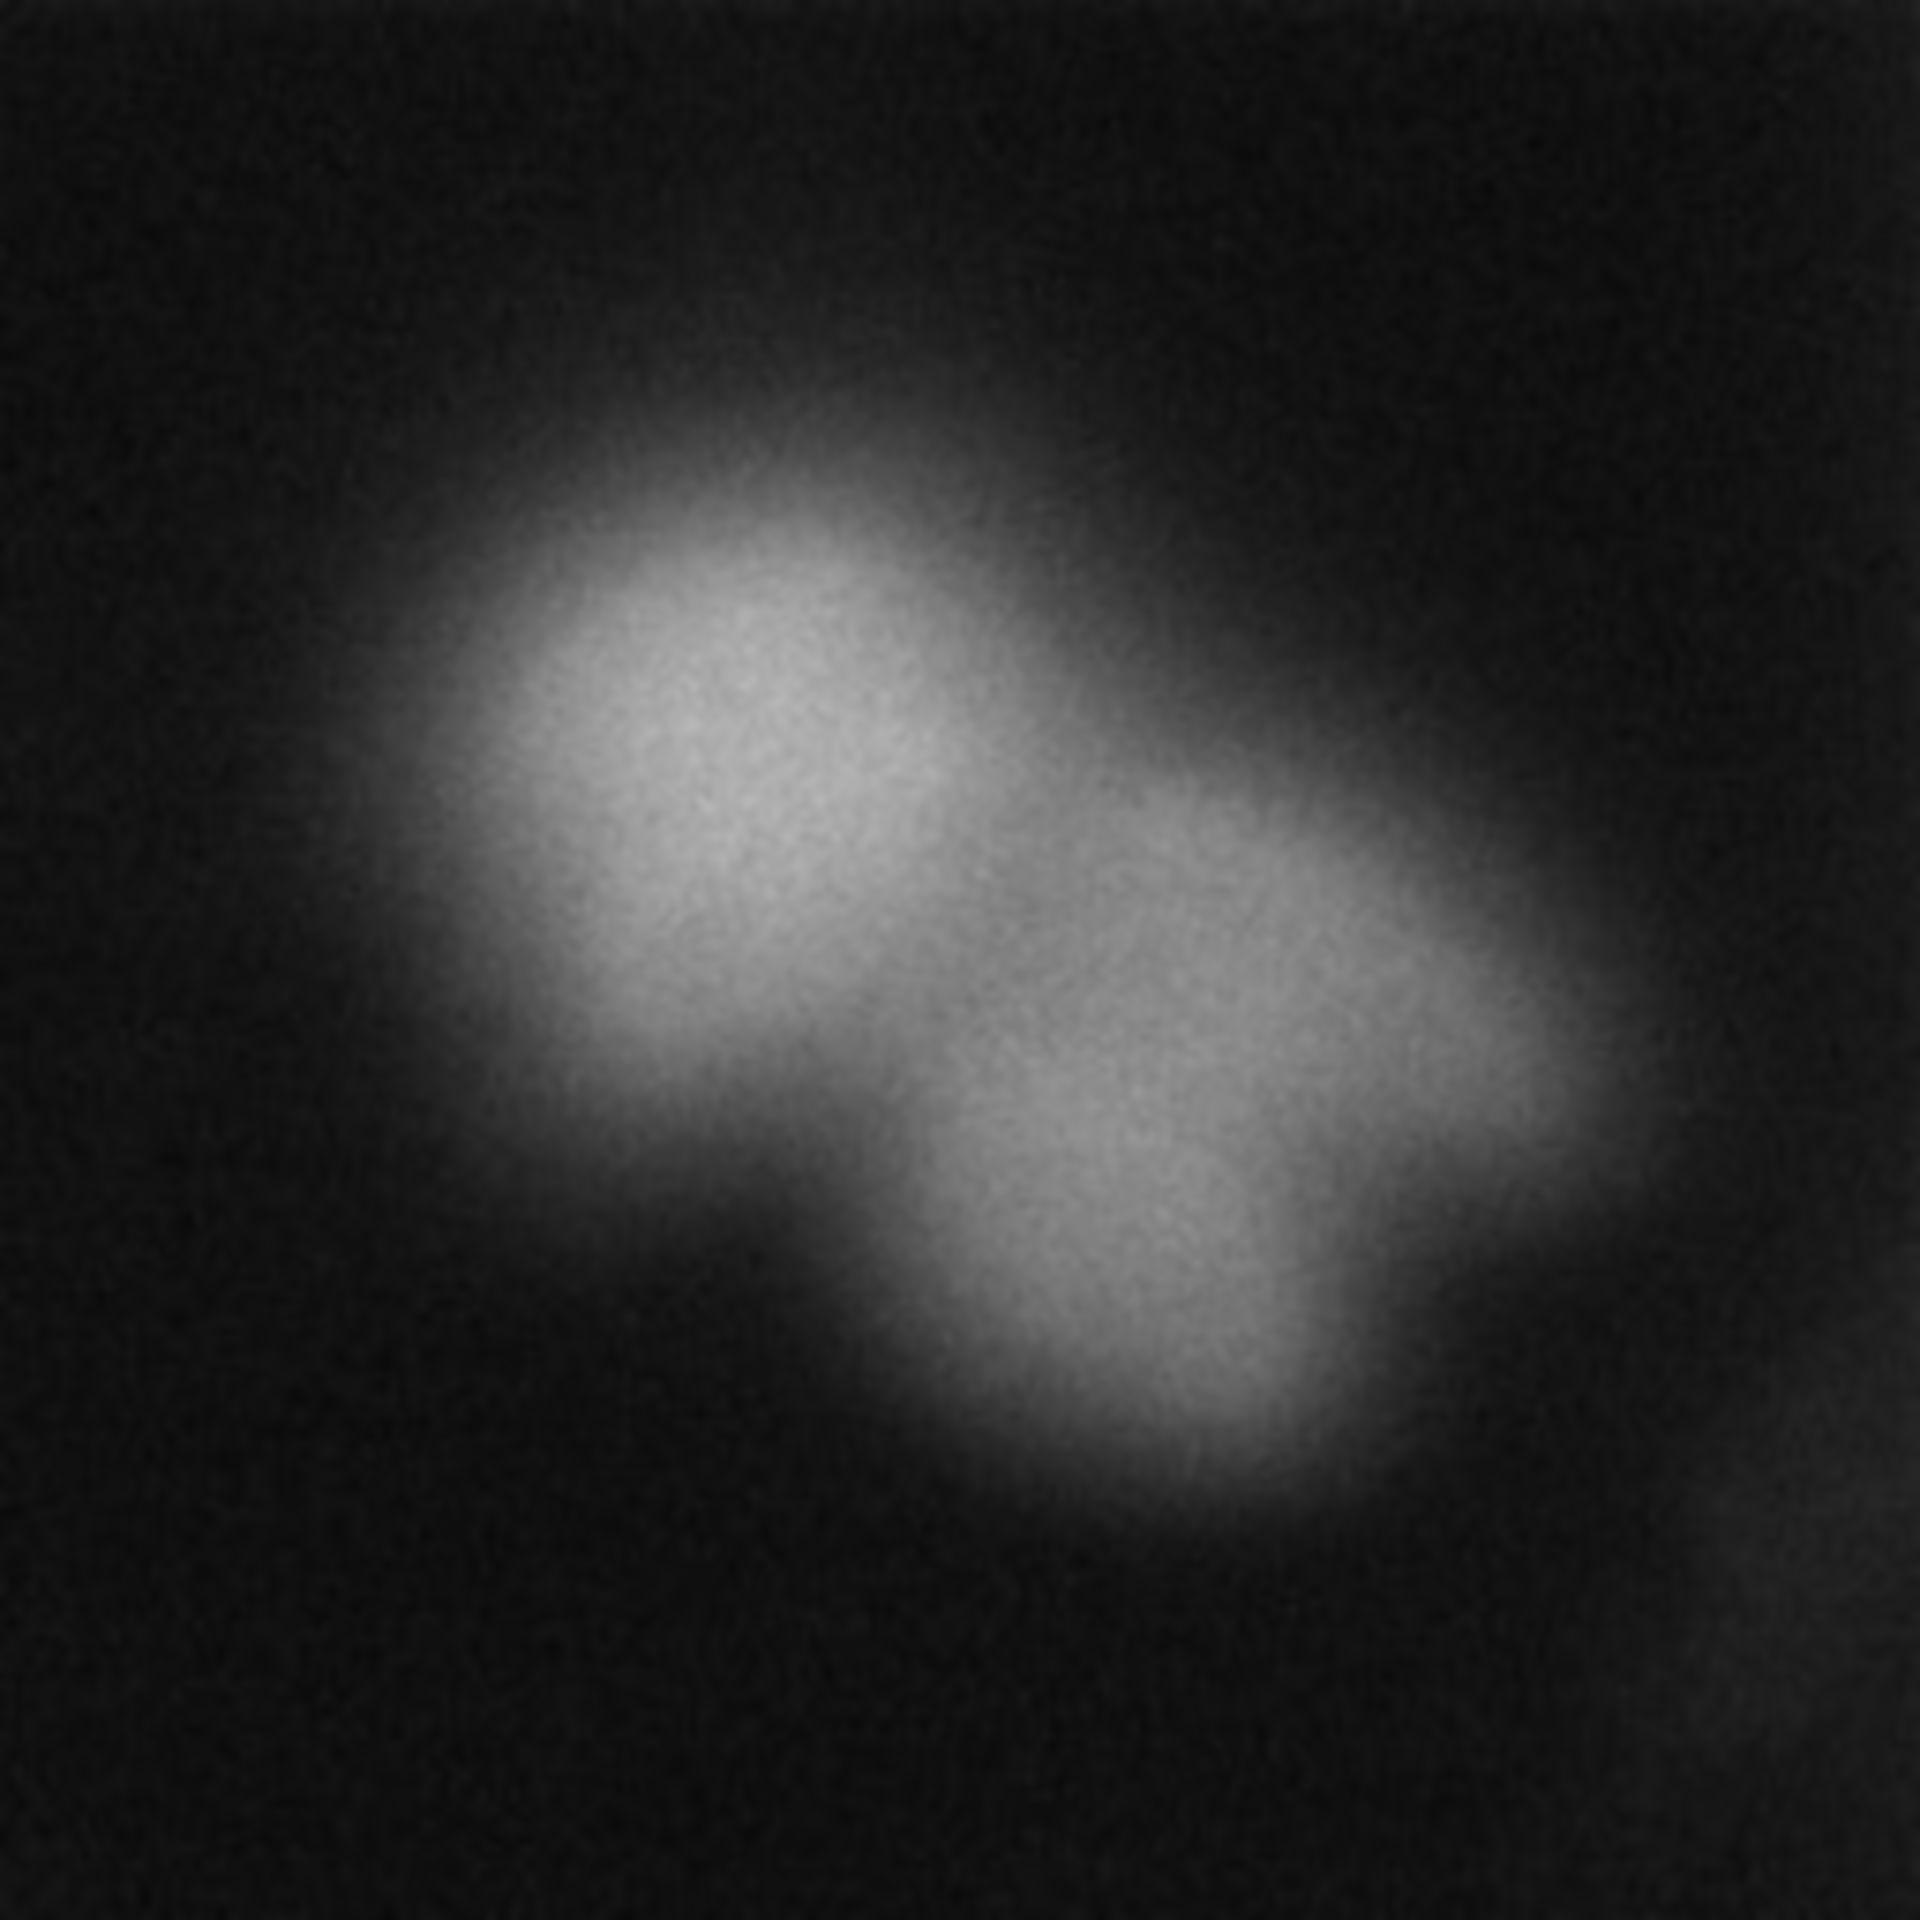 Toxoplasma gondii RH (Cortical microtubule) - CIL:10485